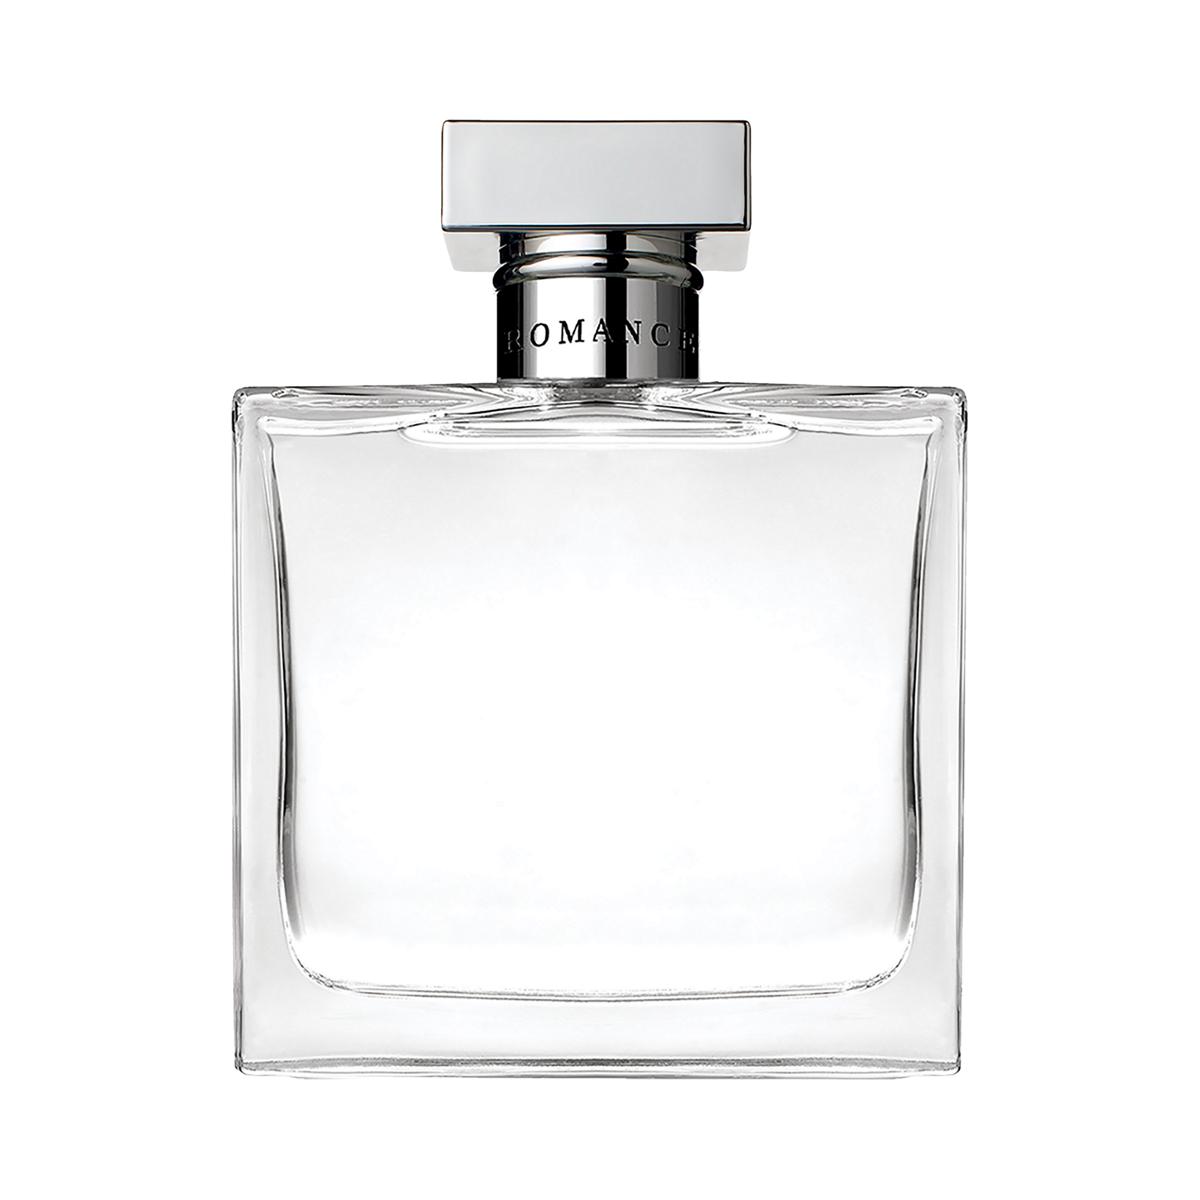 Romance ParfumPerfume De Ralph Eau Lauren 7bY6yvfg